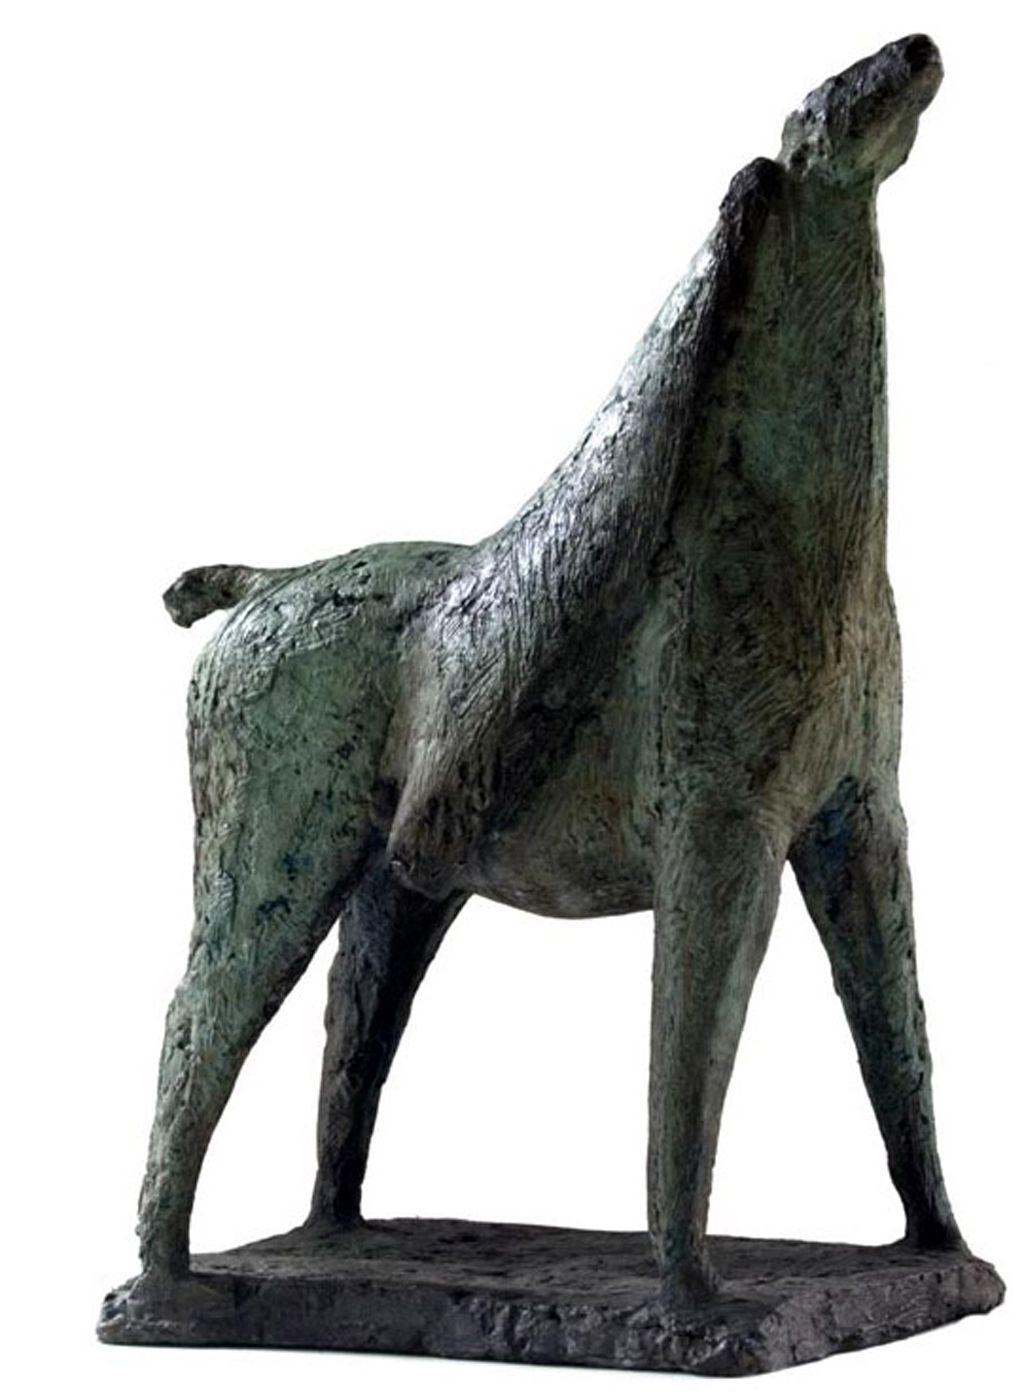 Shona Nunan's bronze sculpture 'Horse and Rider' - unique piece